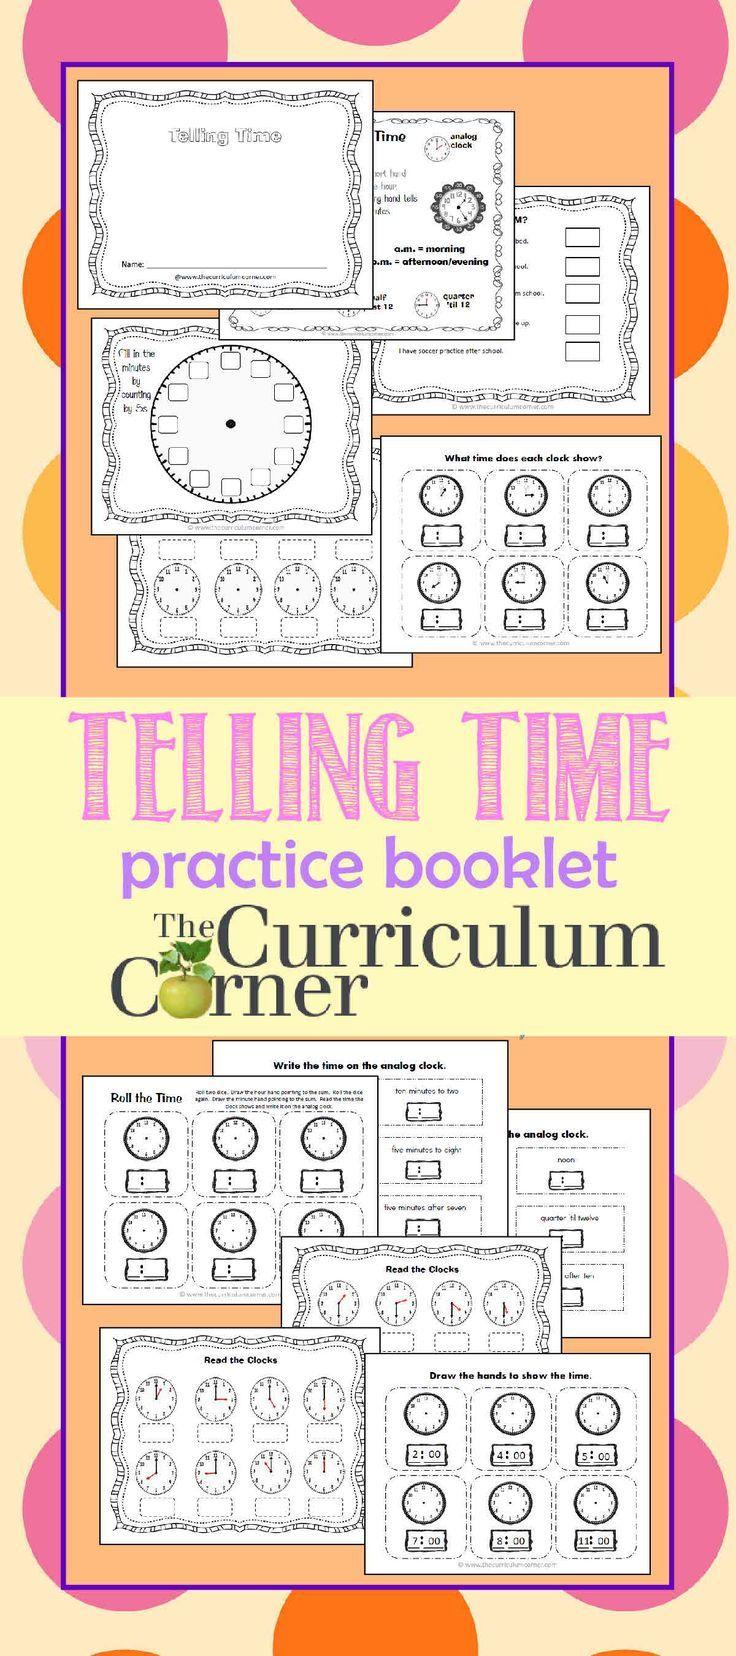 Telling time practice booklet 2 pinterest telling time telling time practice booklet free from the curriculum corner ibookread Download